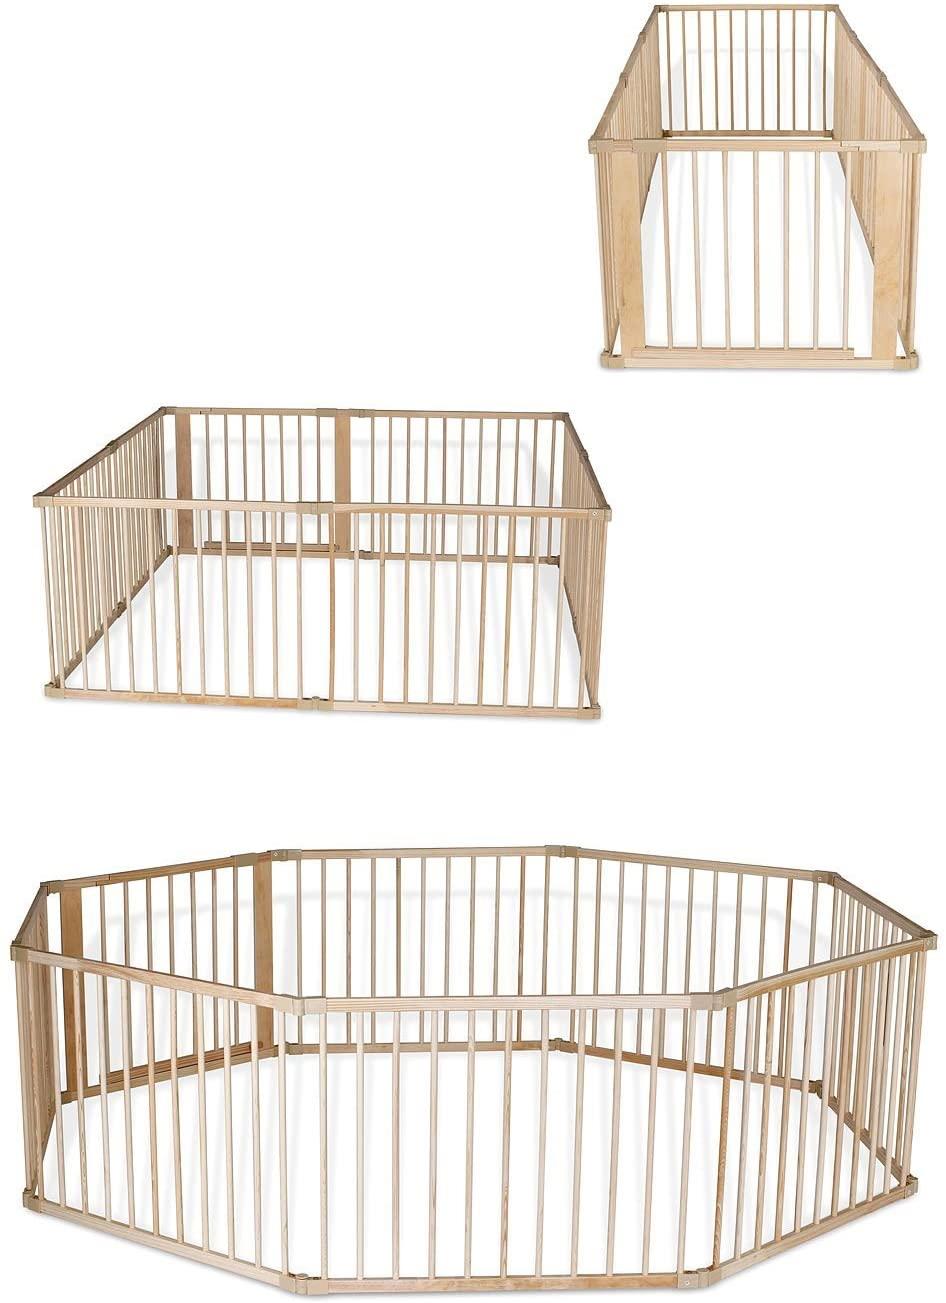 Dibea BP00582 - Parque de madera para Bebé, (68 cm alto), 8 elementos (a 90x65 cm) incl puerta